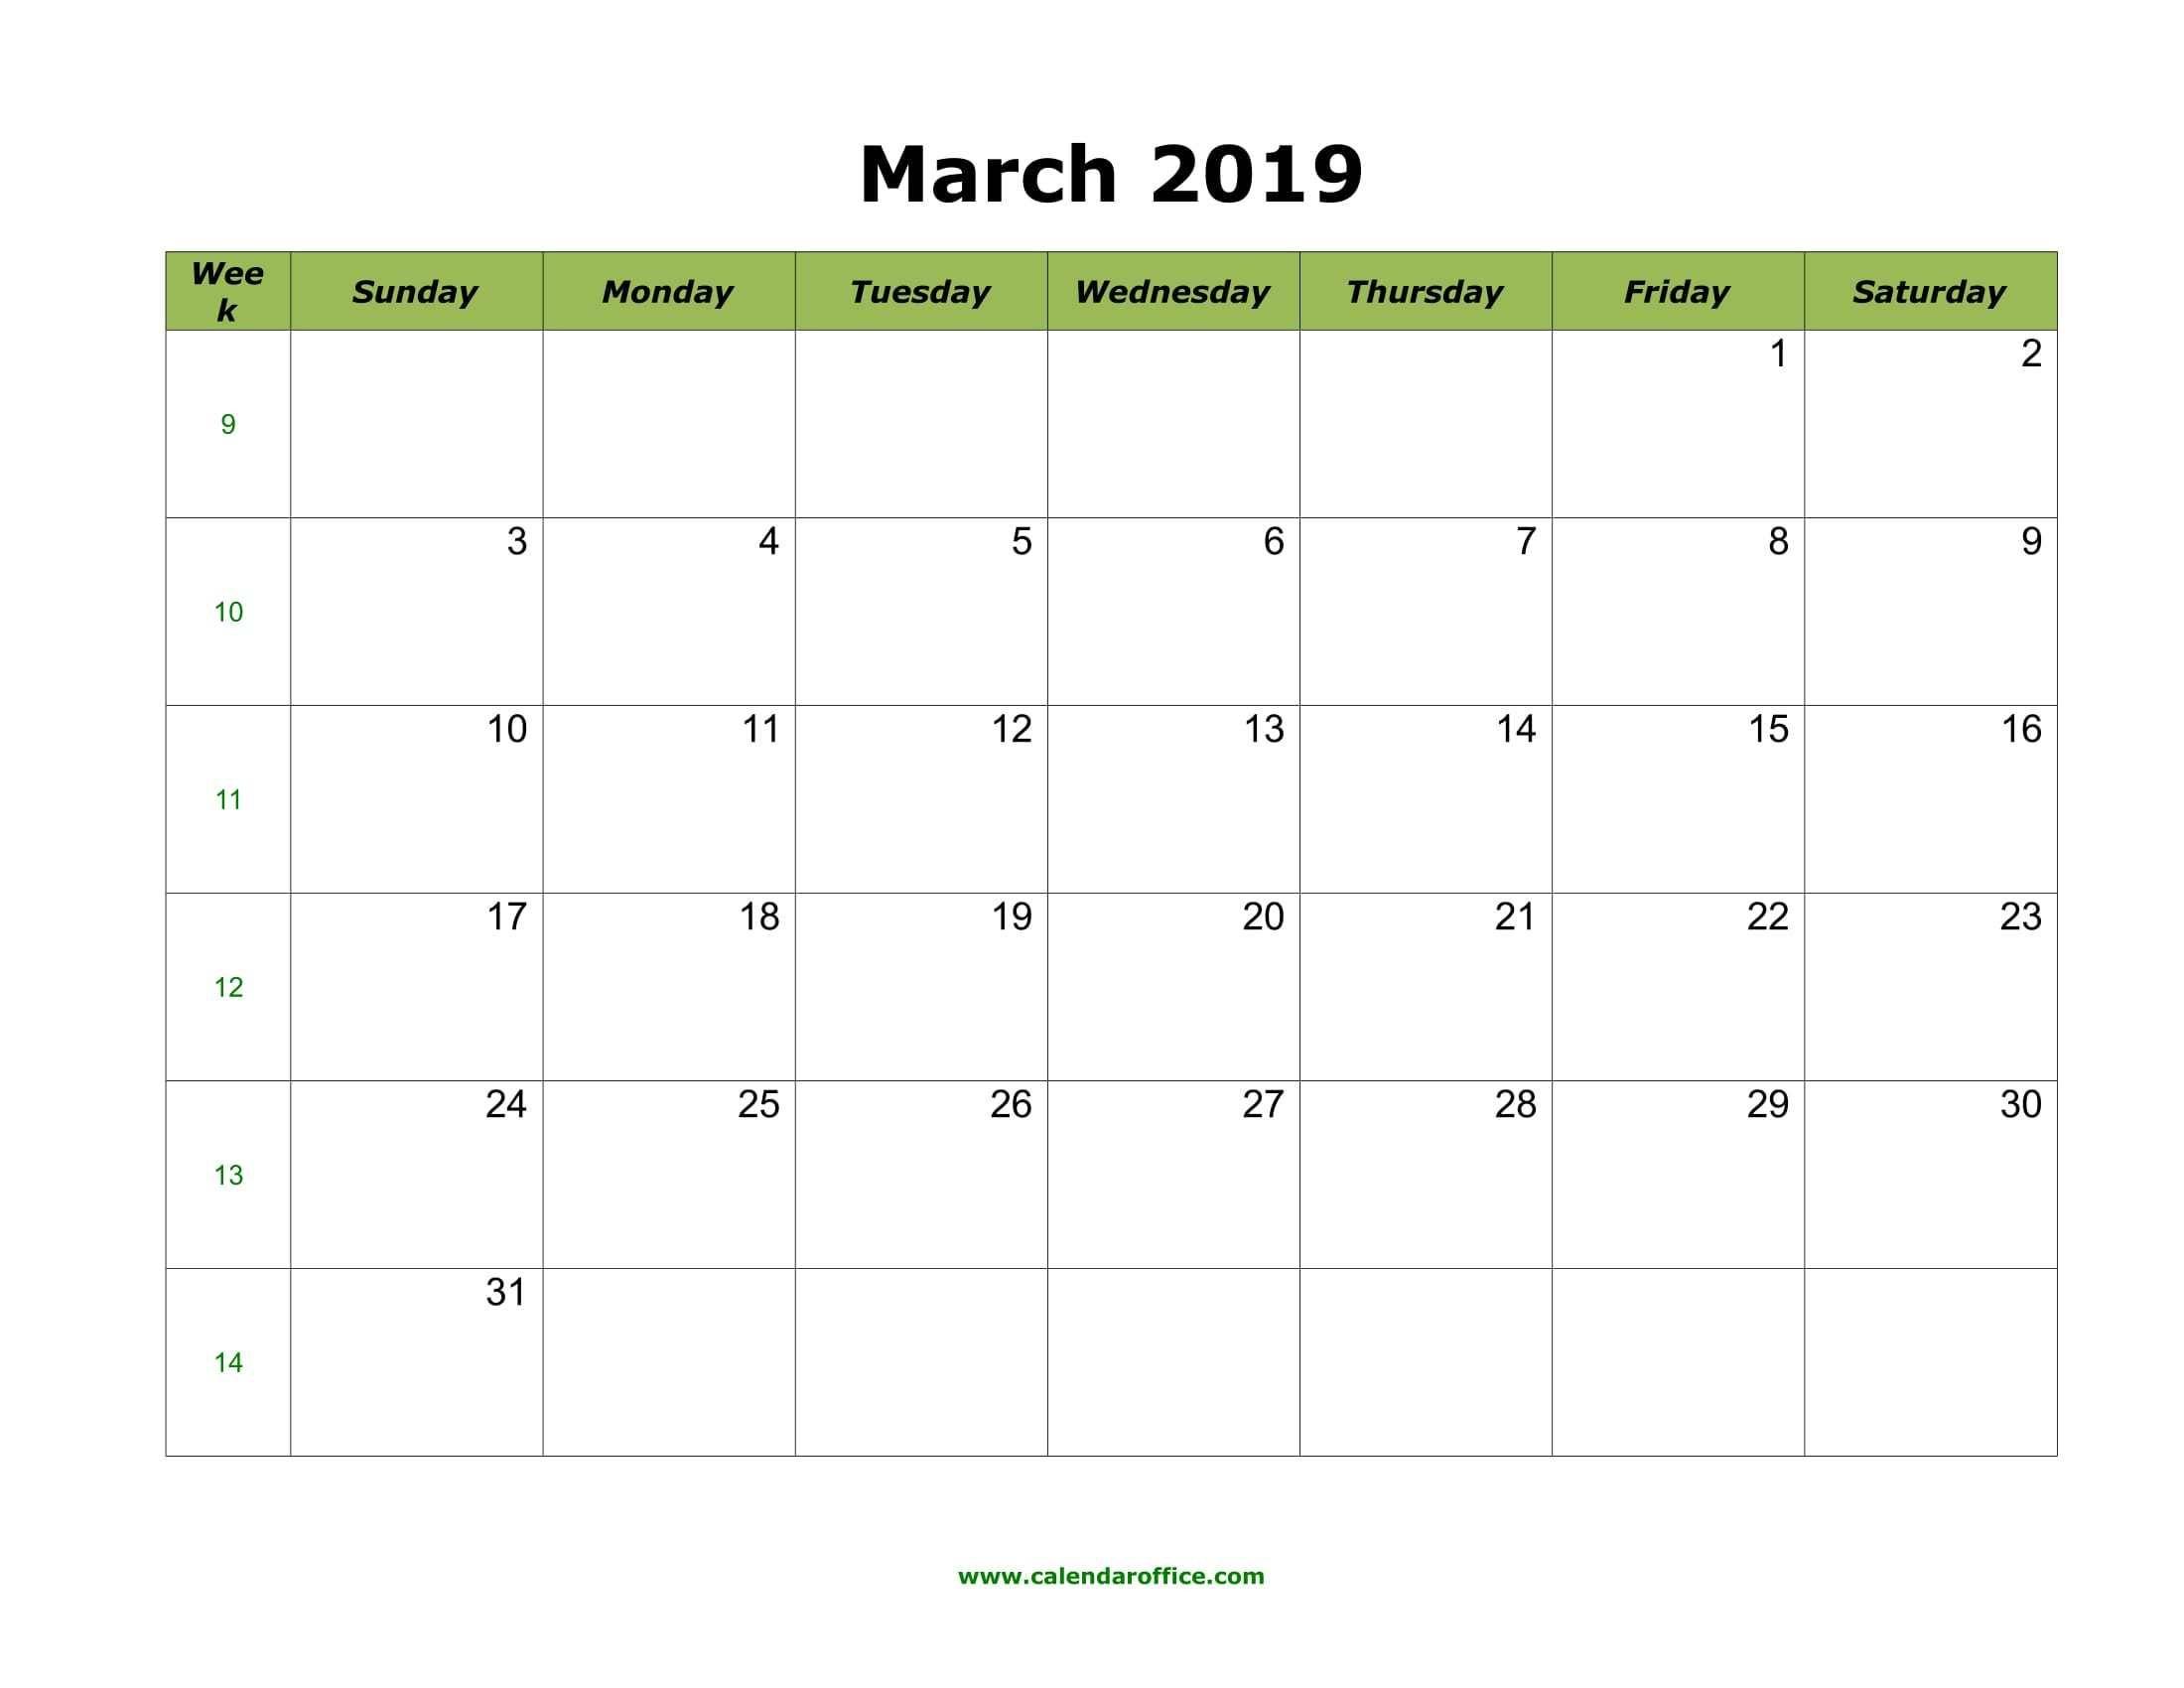 March 2019 Calendar Template March April May 2019calendar 2019